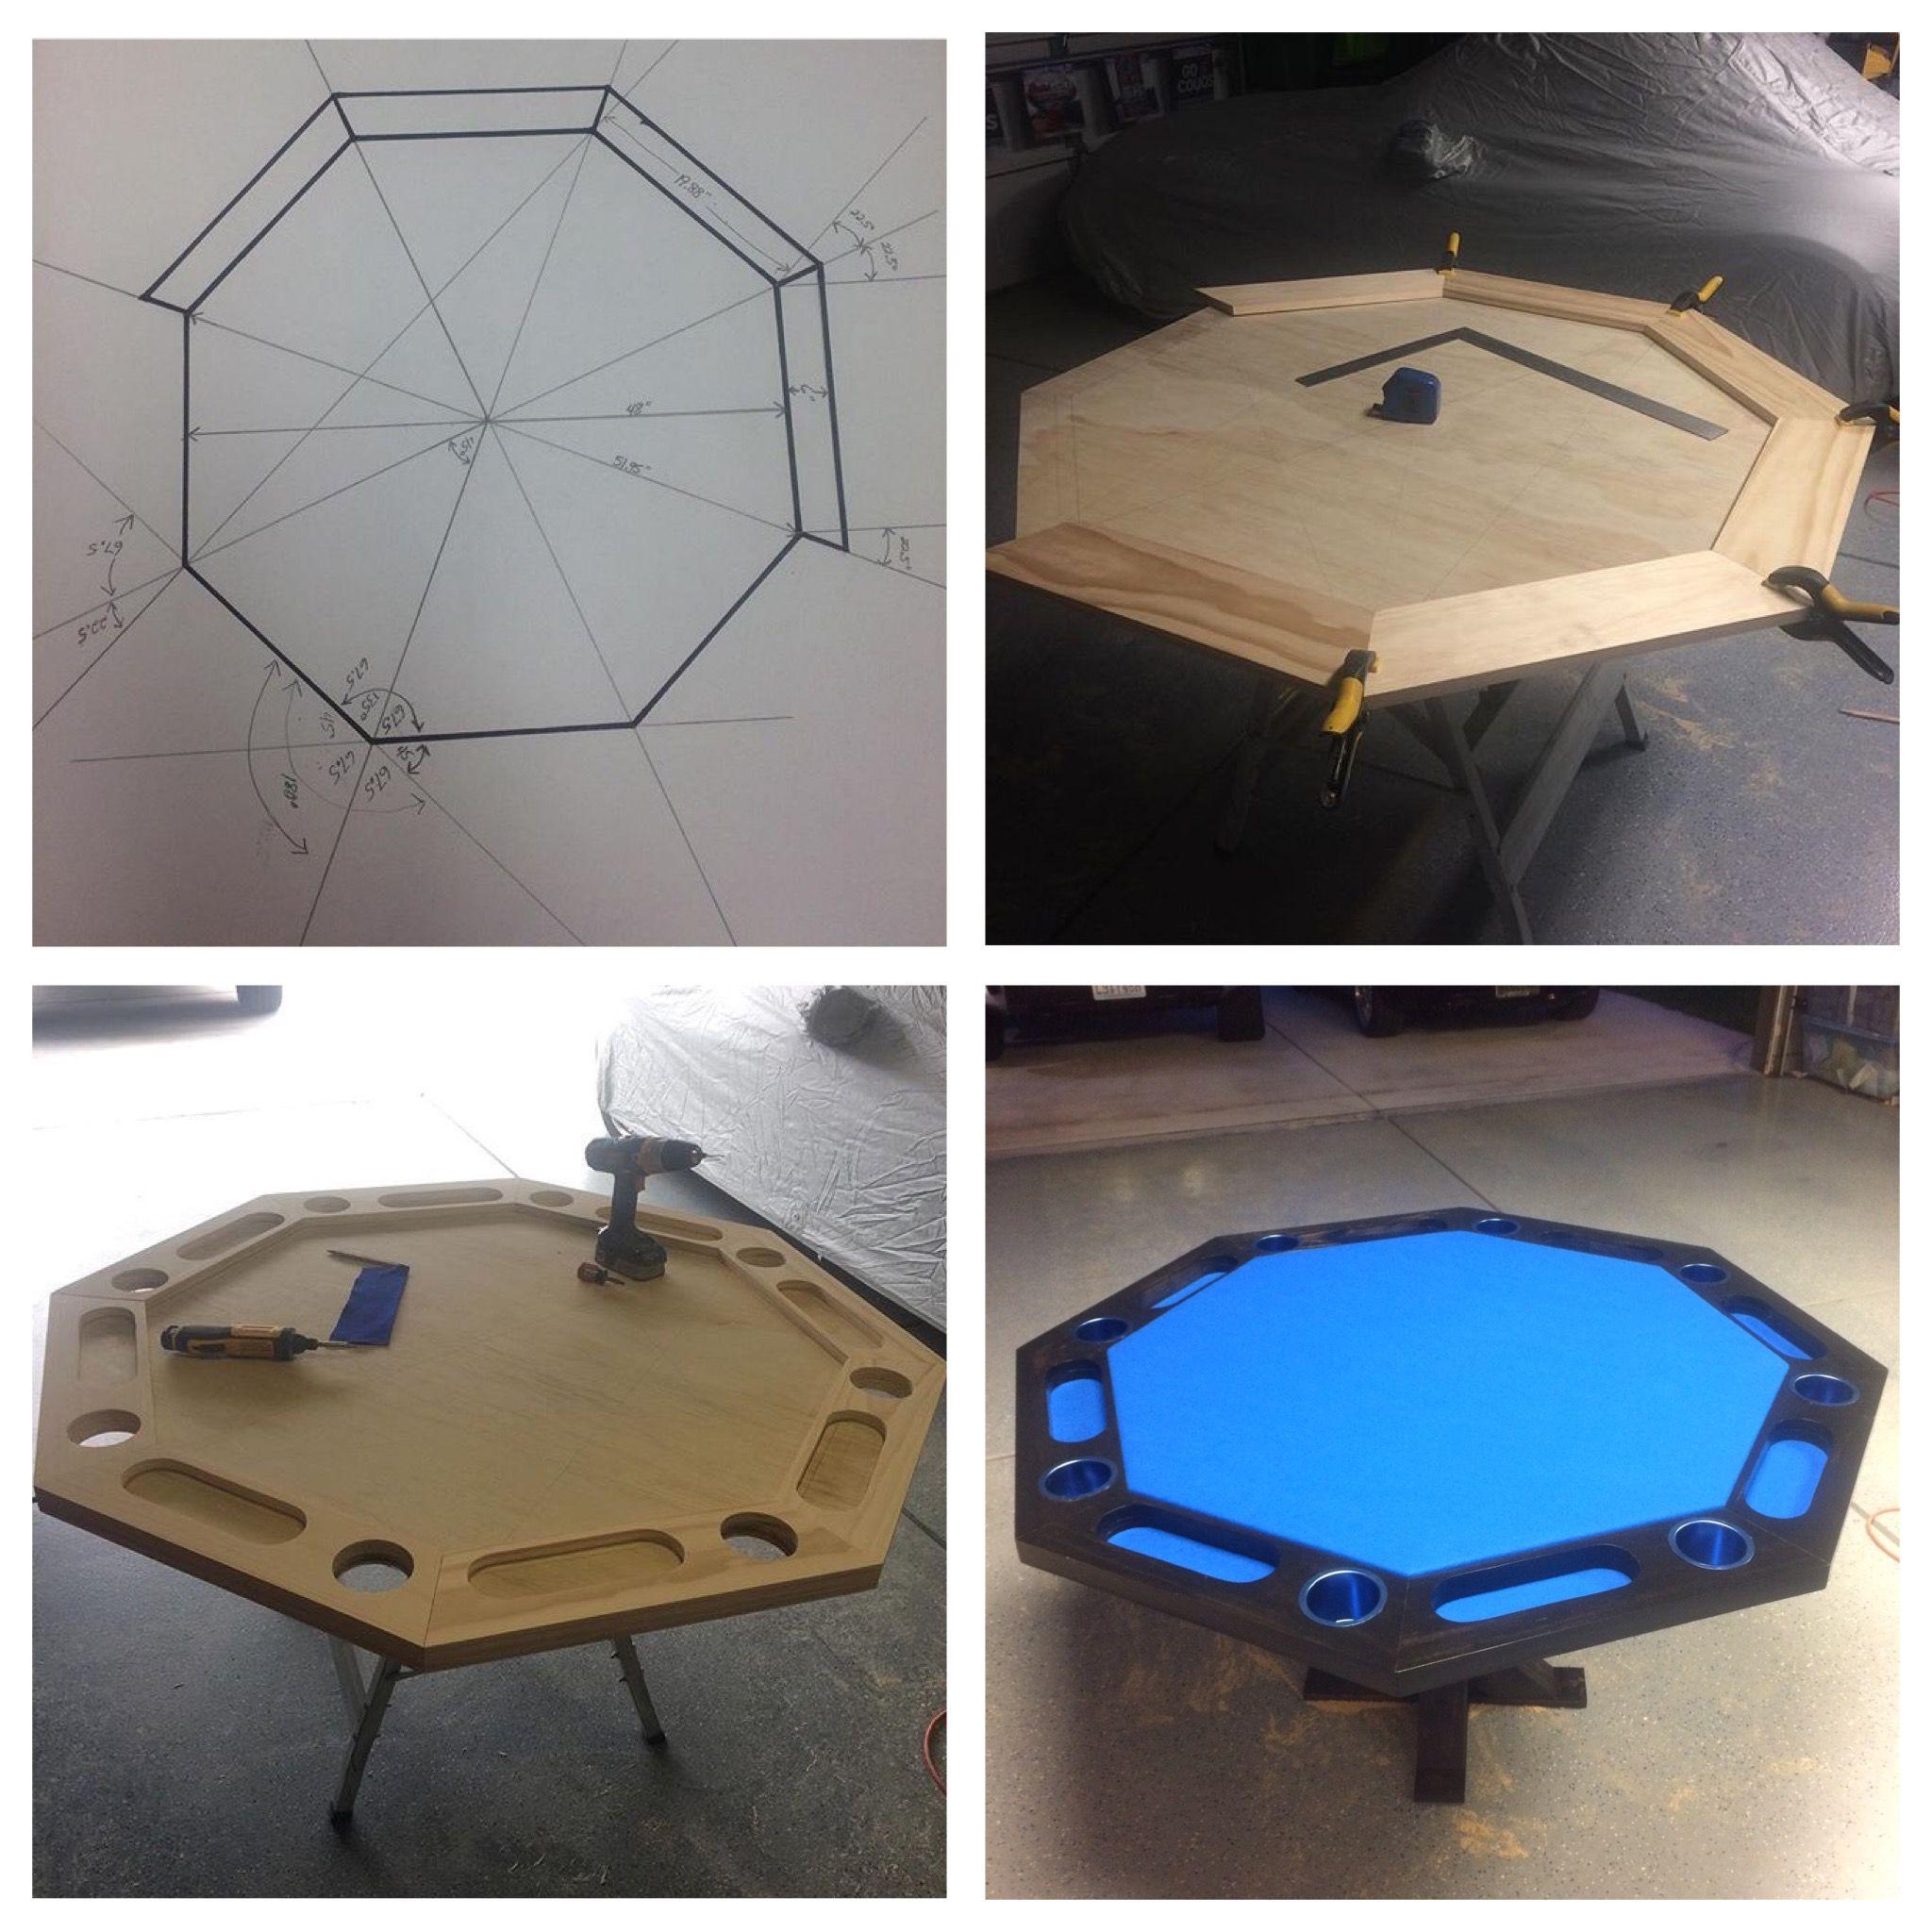 Pin By Nick Ippolito On House Stuff Poker Table Diy Poker Table Plans Octagon Poker Table